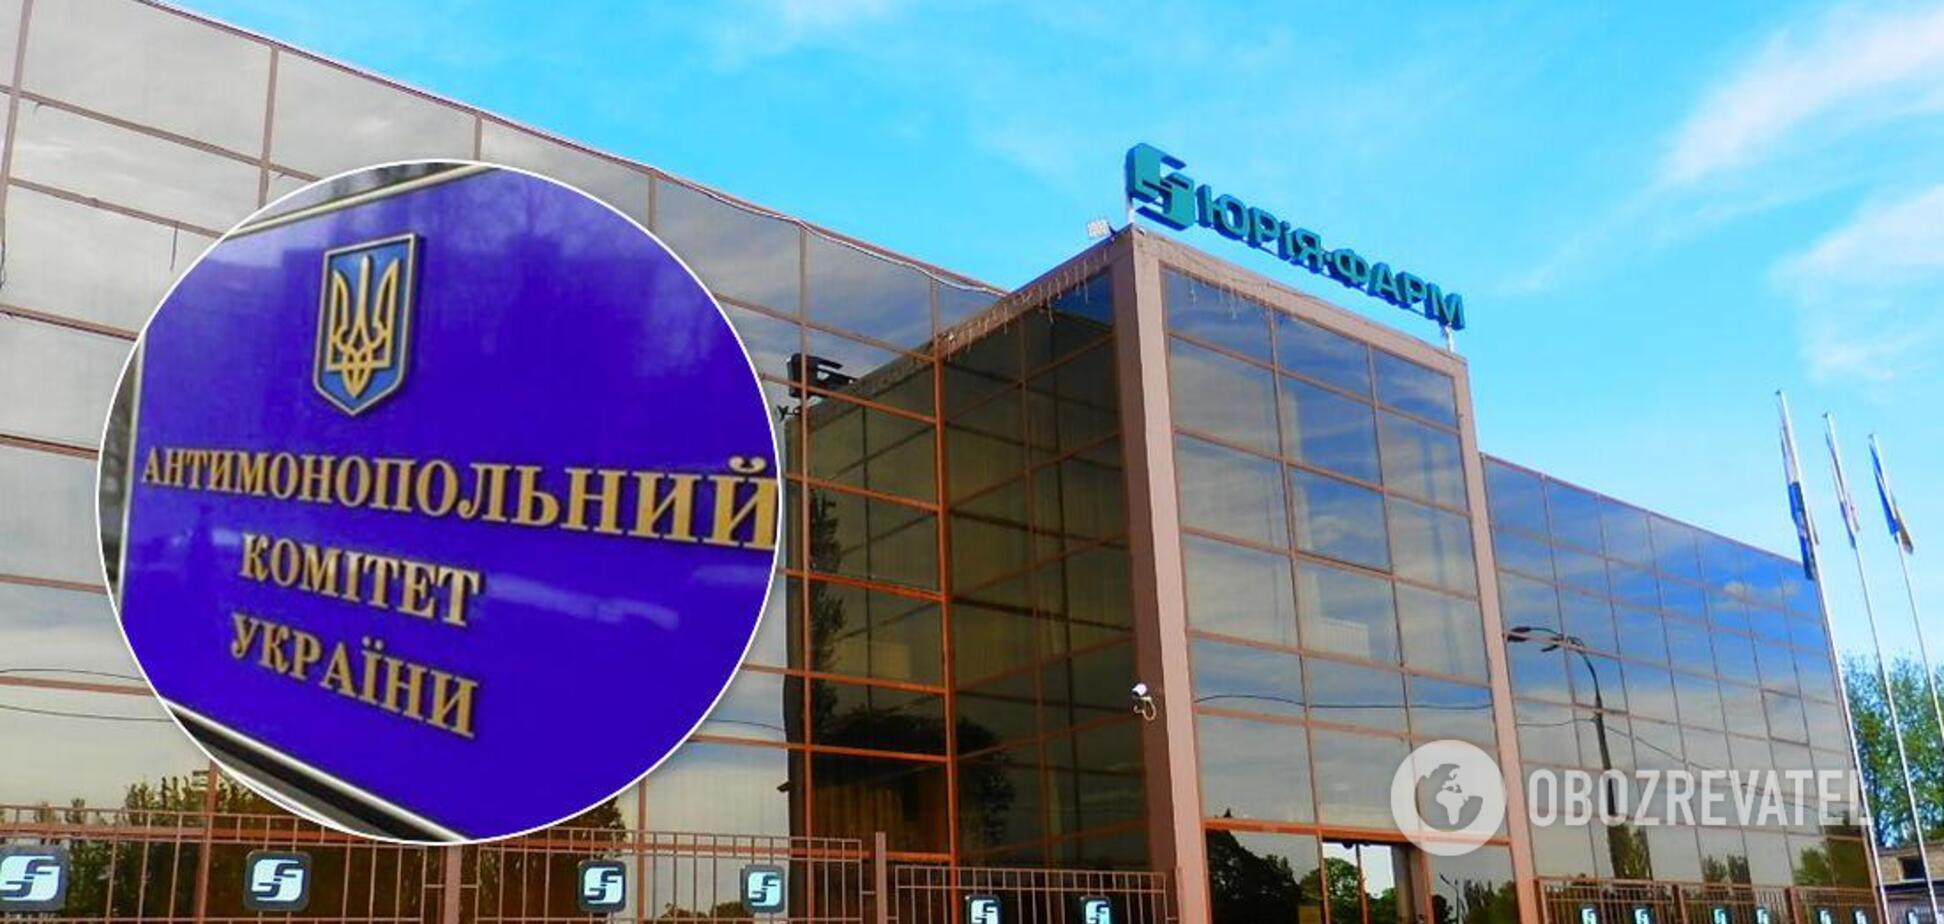 Компанию 'Юрия-Фарм' оштрафовали за рекламу лекарства от COVID-19